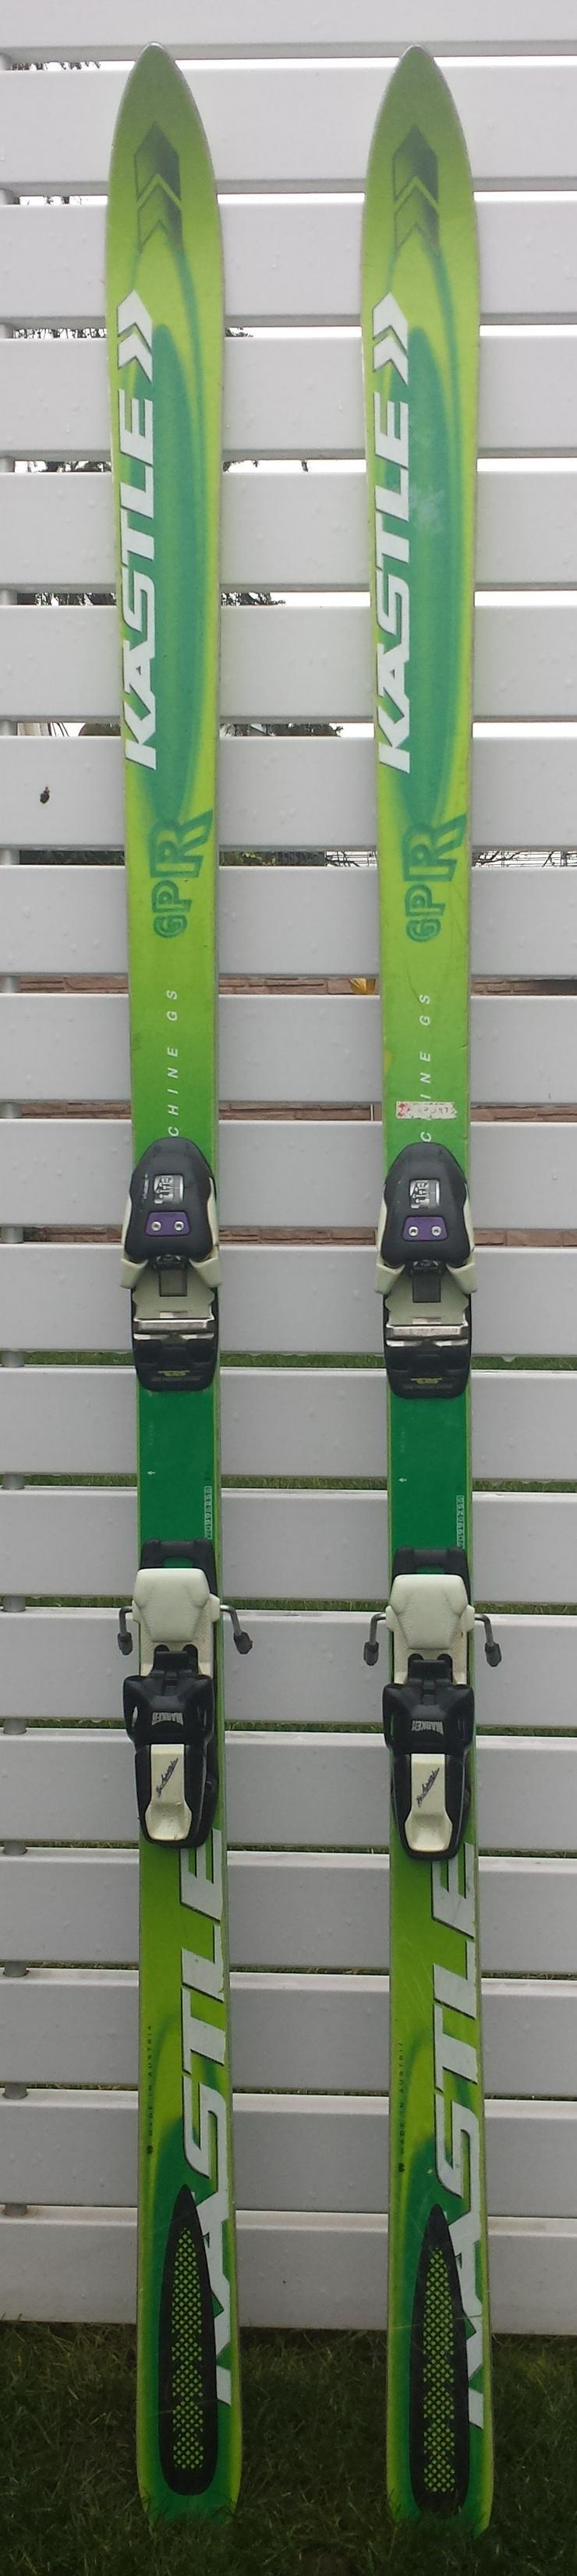 Bild 4: Ski, wintersport, Skistöcke